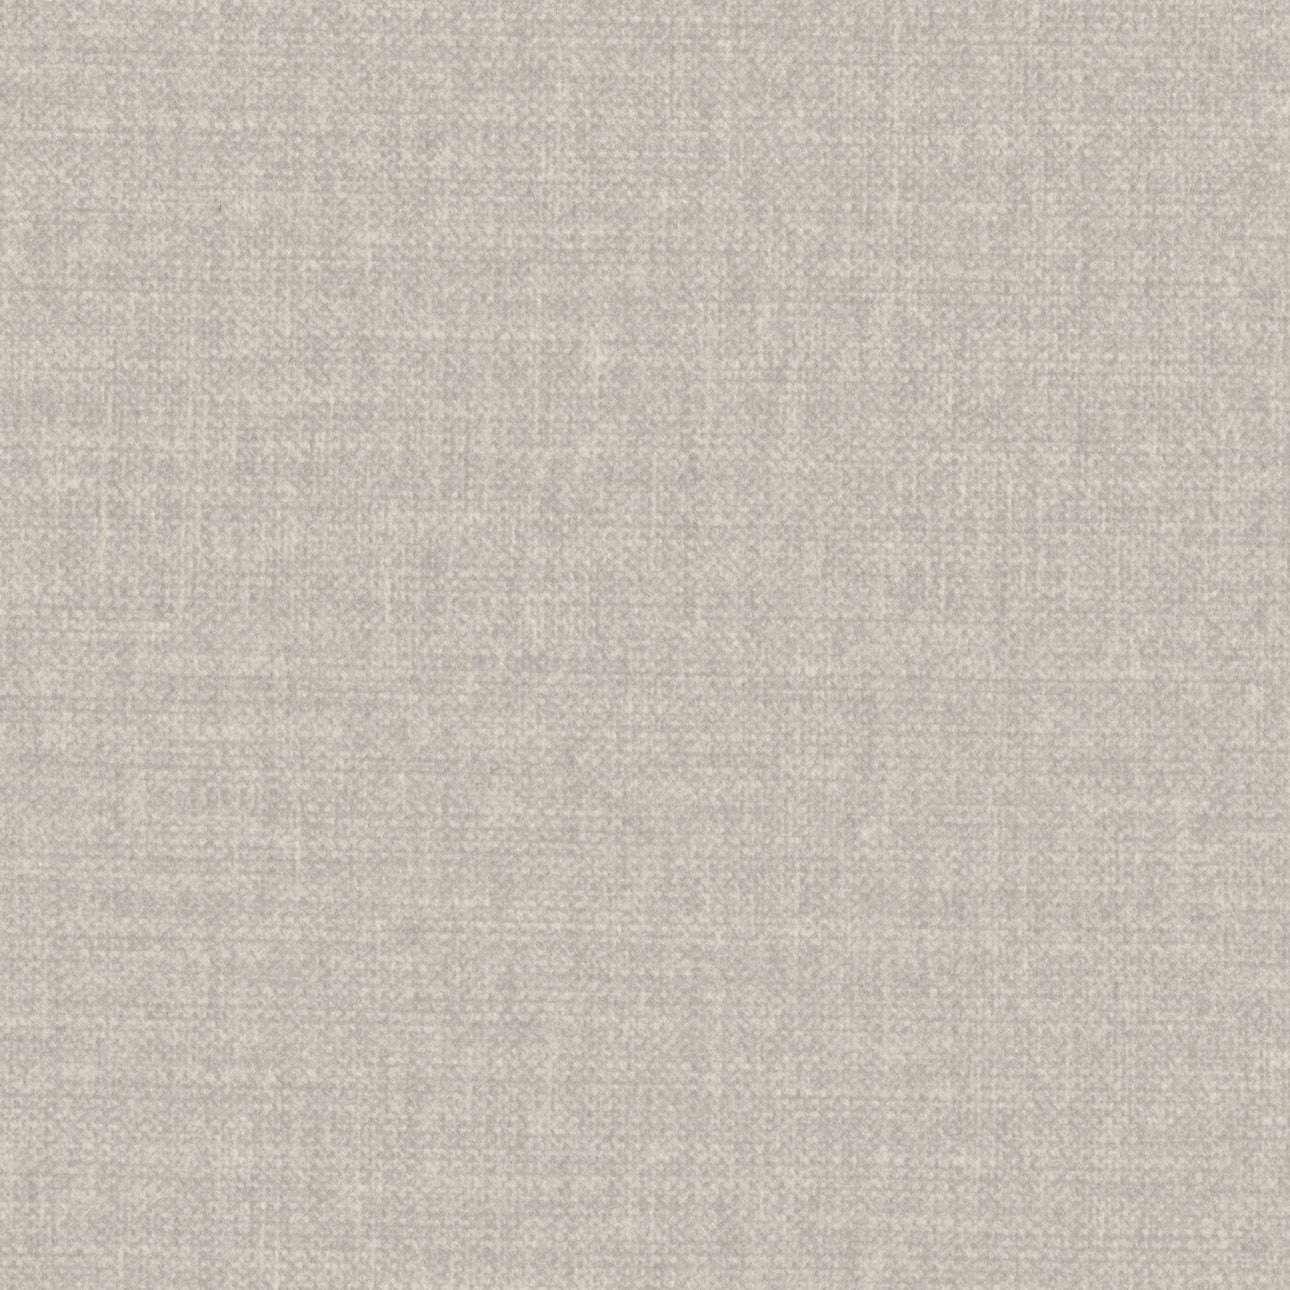 Siddepuf og fodskammel fra kollektionen Ingrid, Stof: 705-40